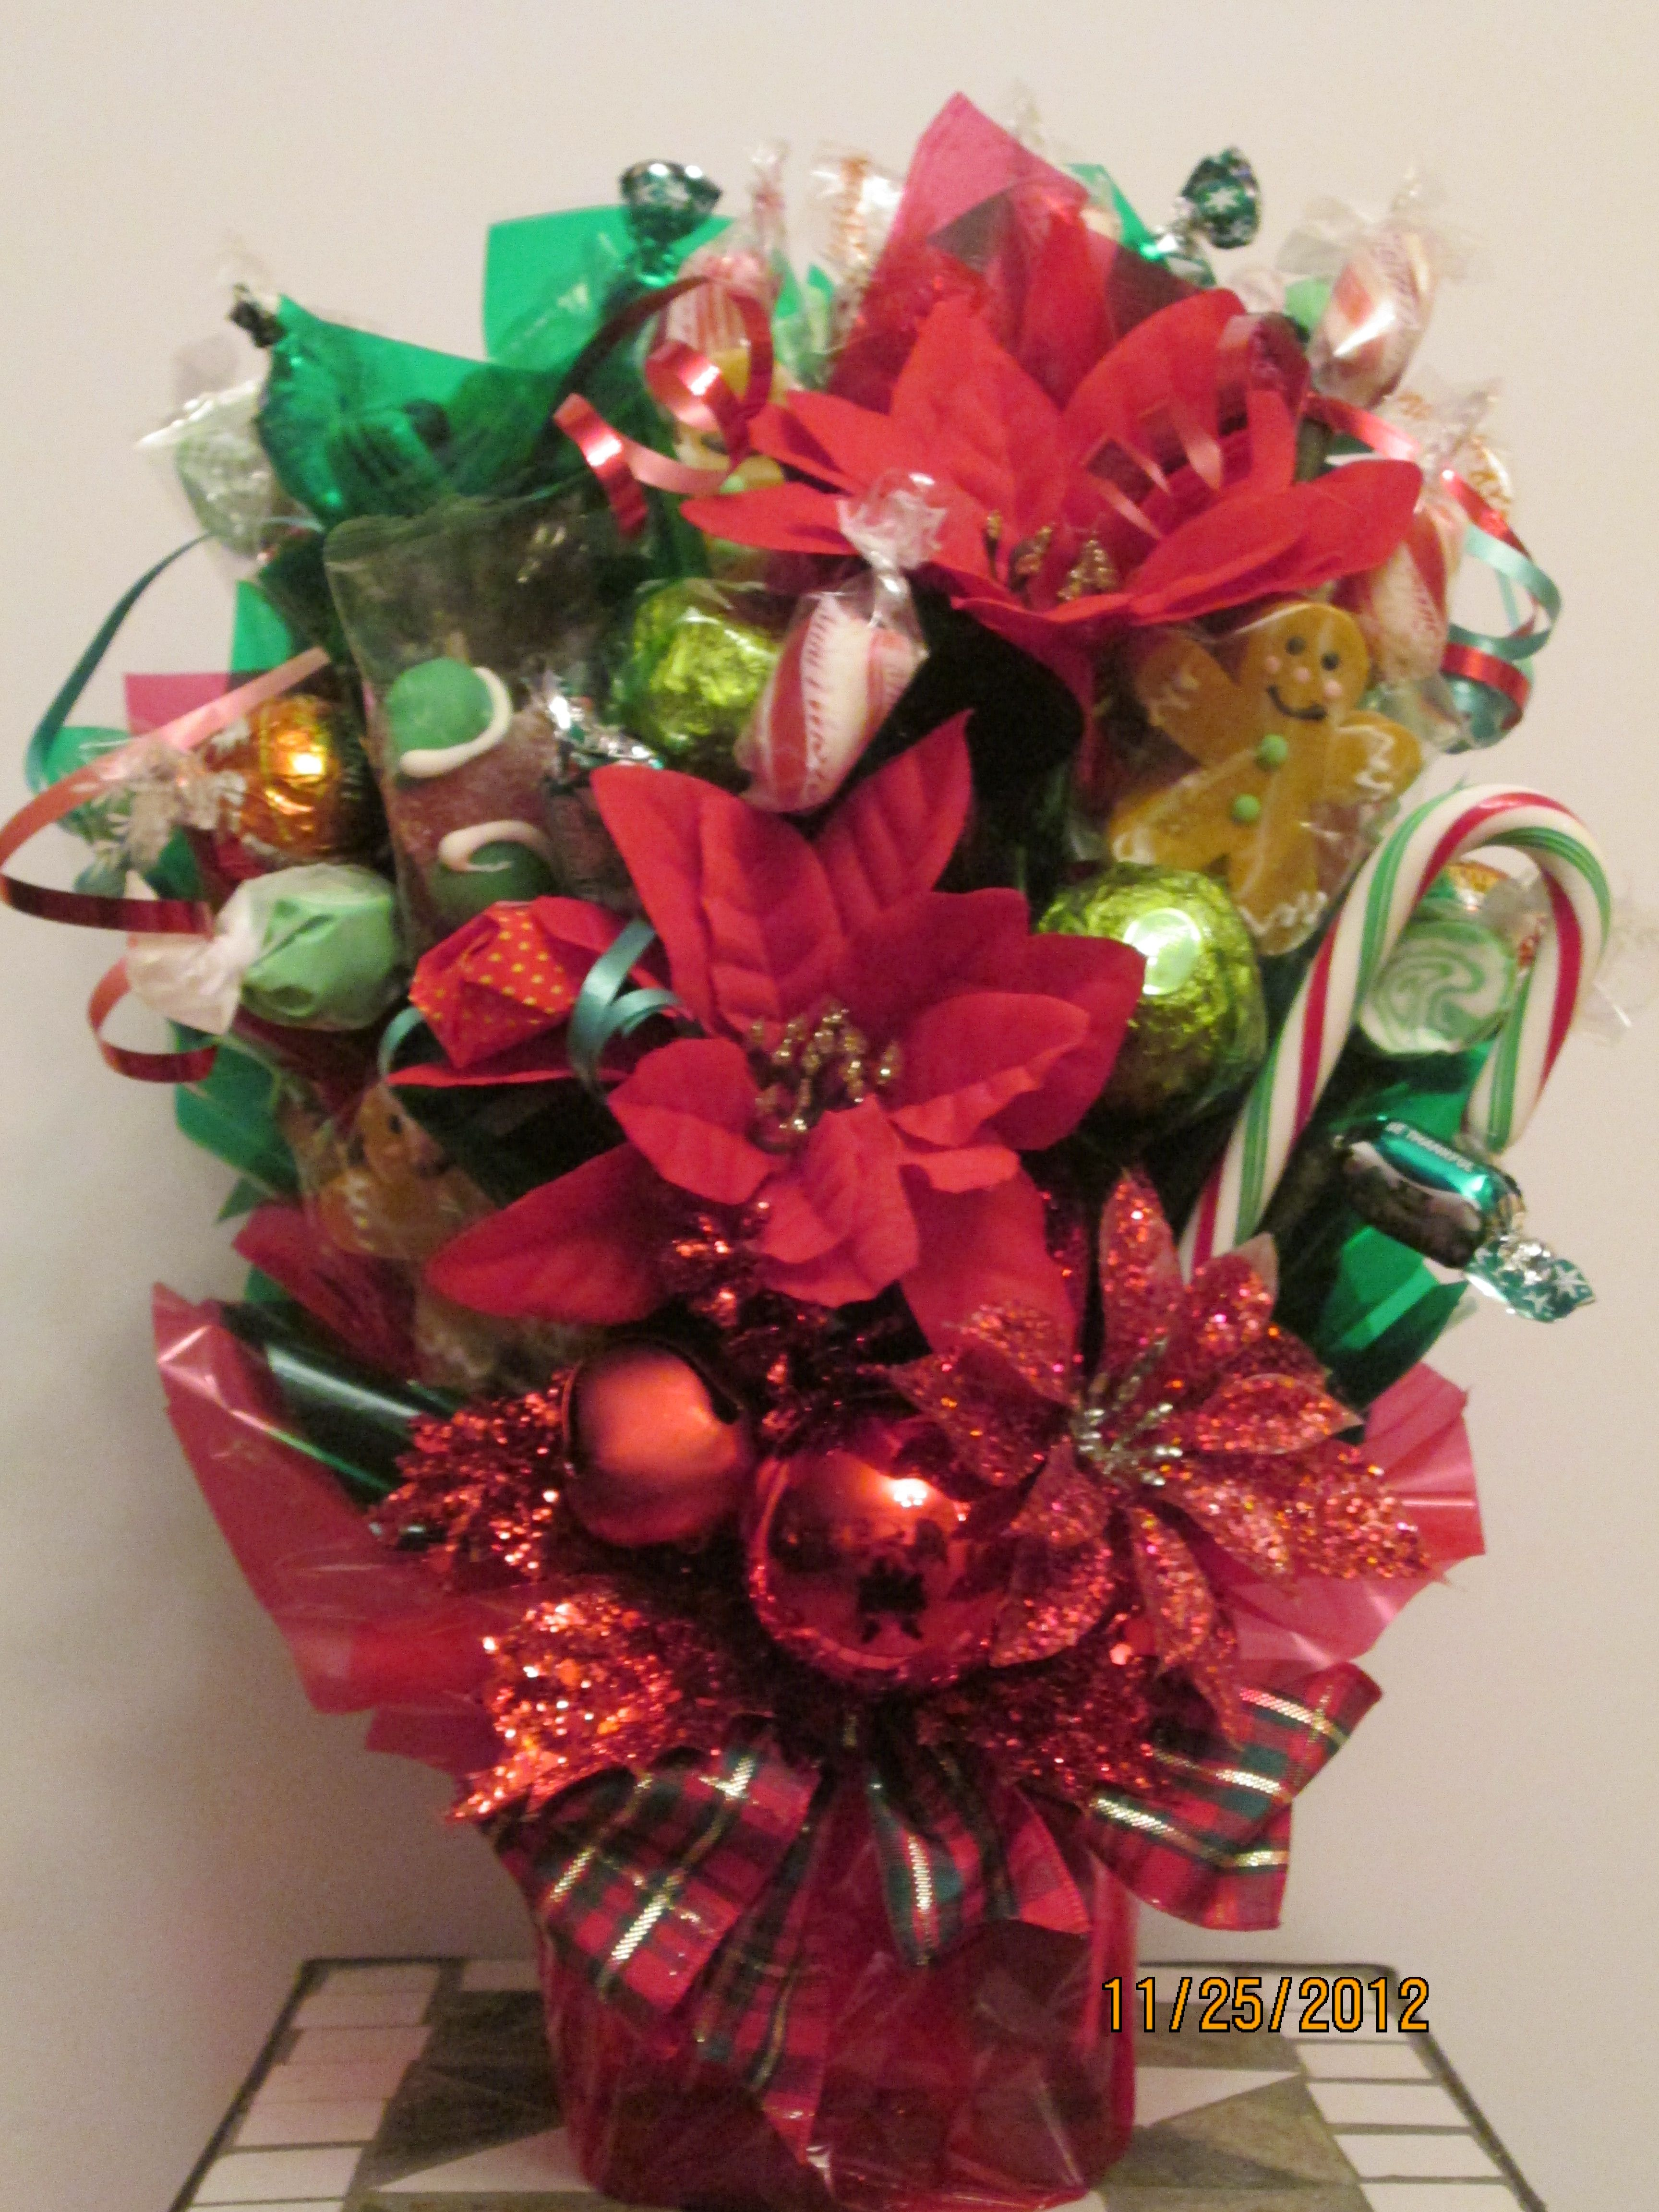 Candy bouquet by ana bonboni bouquet candy bouquets and candy bouquet by ana izmirmasajfo Choice Image